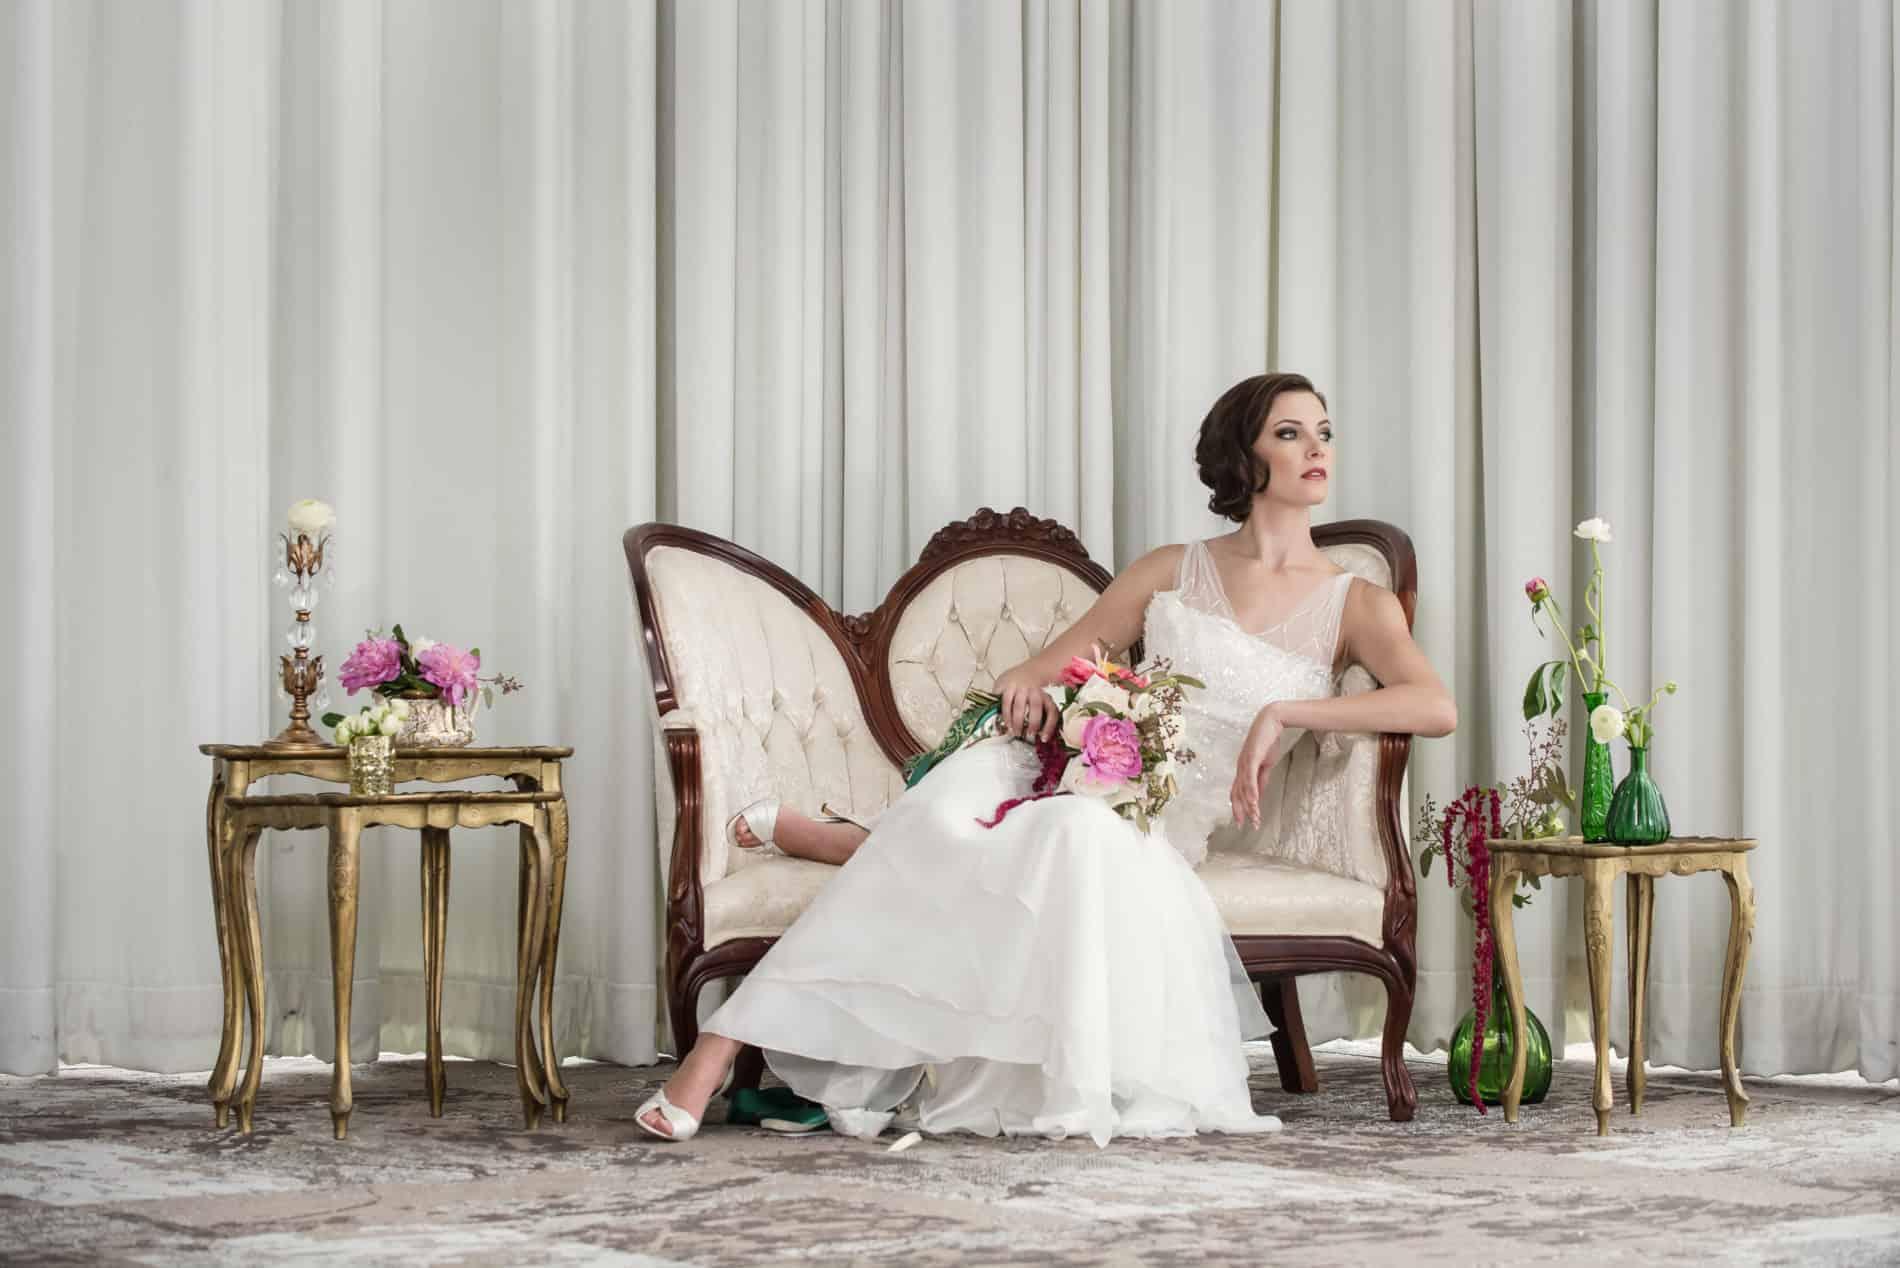 Doctor Phillips Art Center Wedding Venue